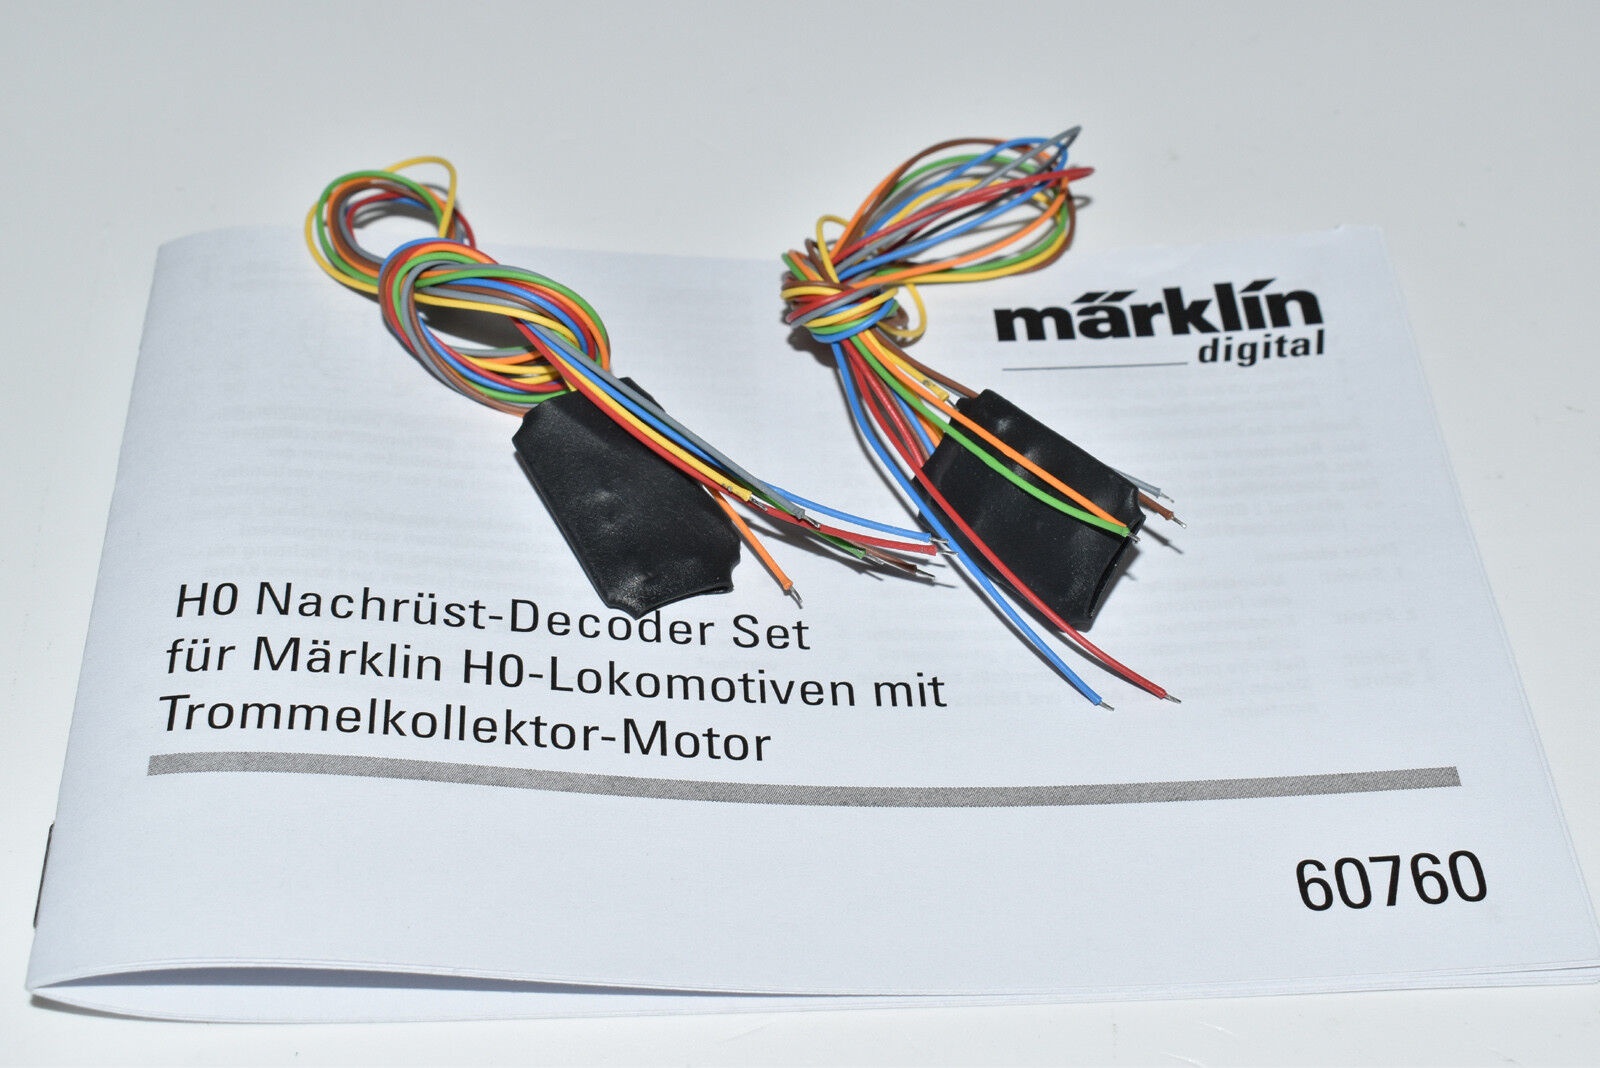 Märklin 2 x decoder da 60760 60760 60760 FX decodificatore digitale Set decoderset Merce Nuova b84b94